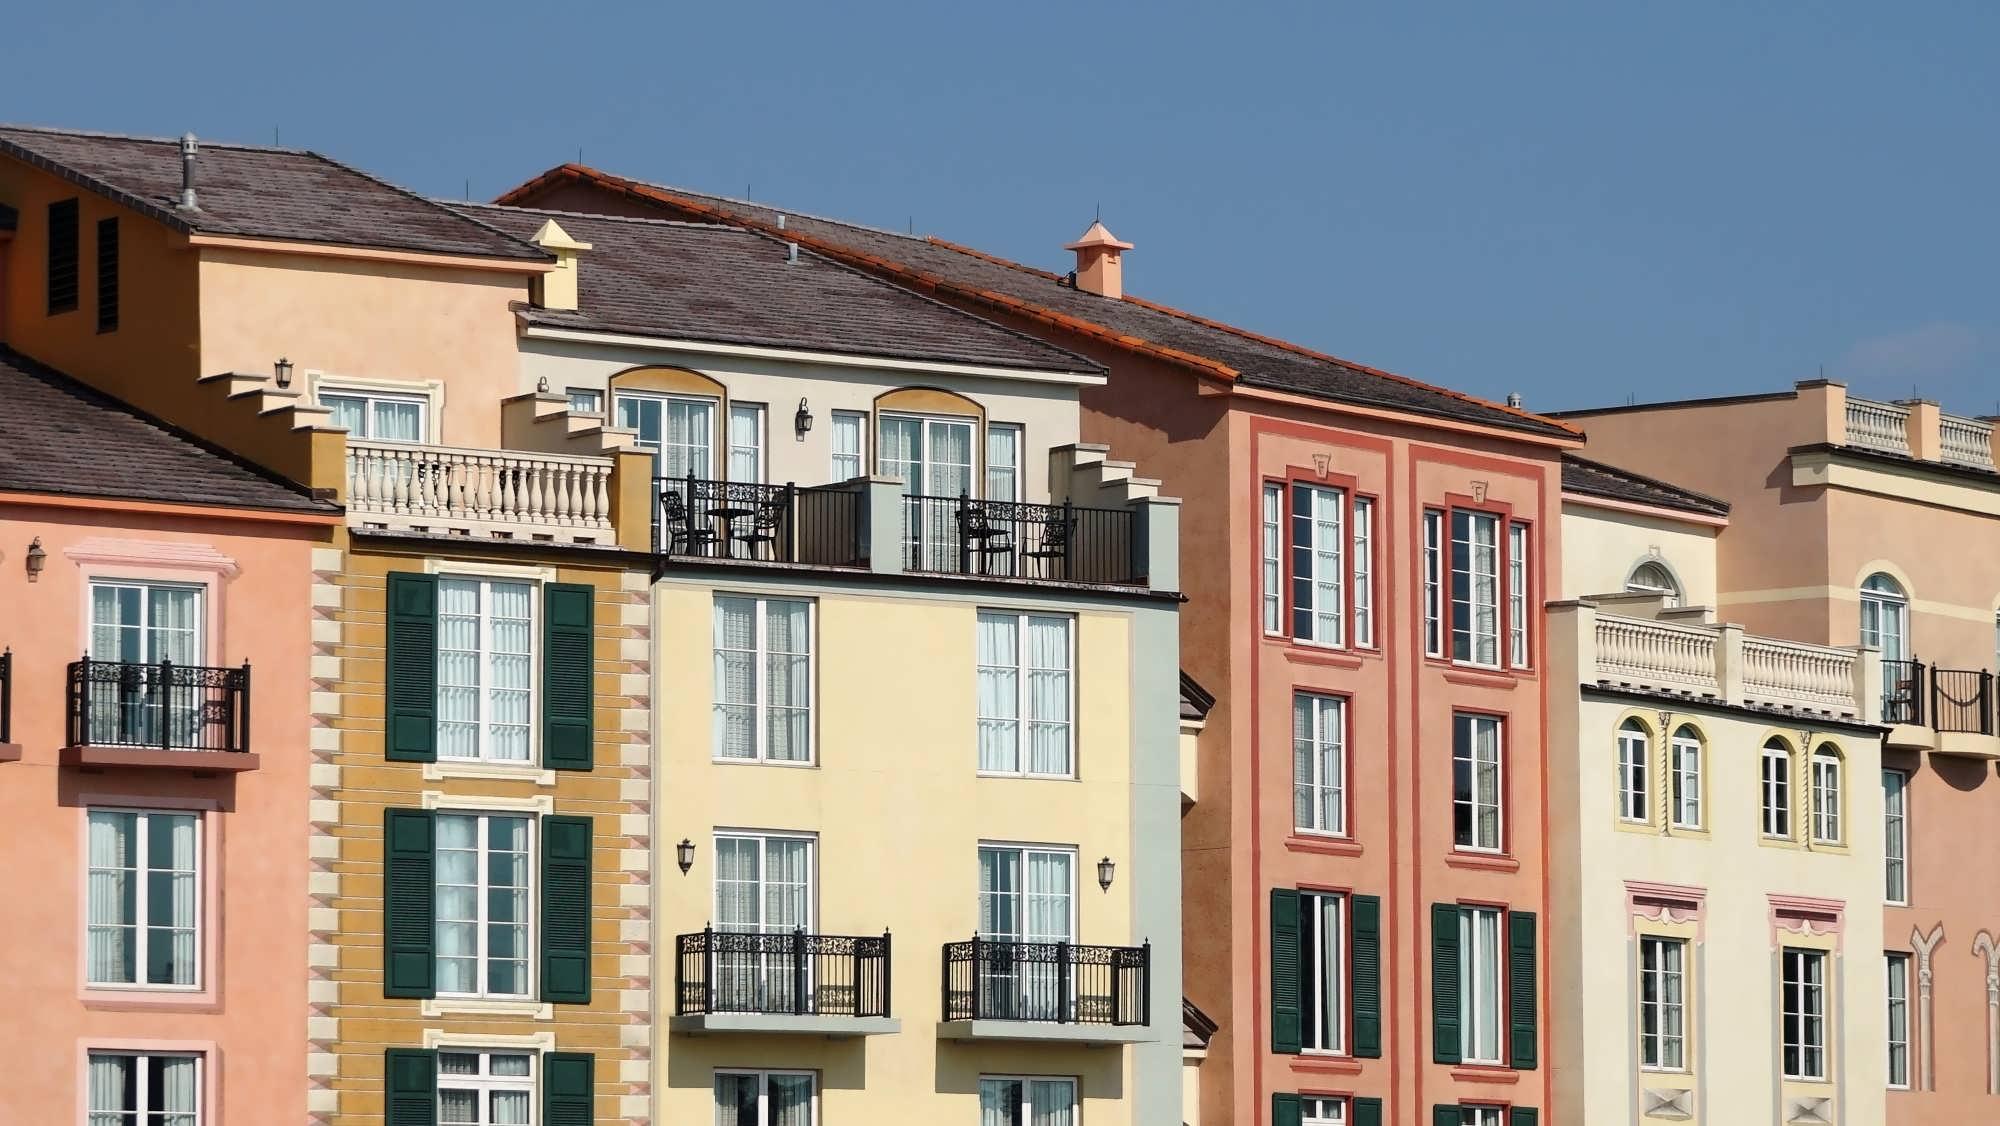 Juliette and full balconies at Portofino Bay Hotel